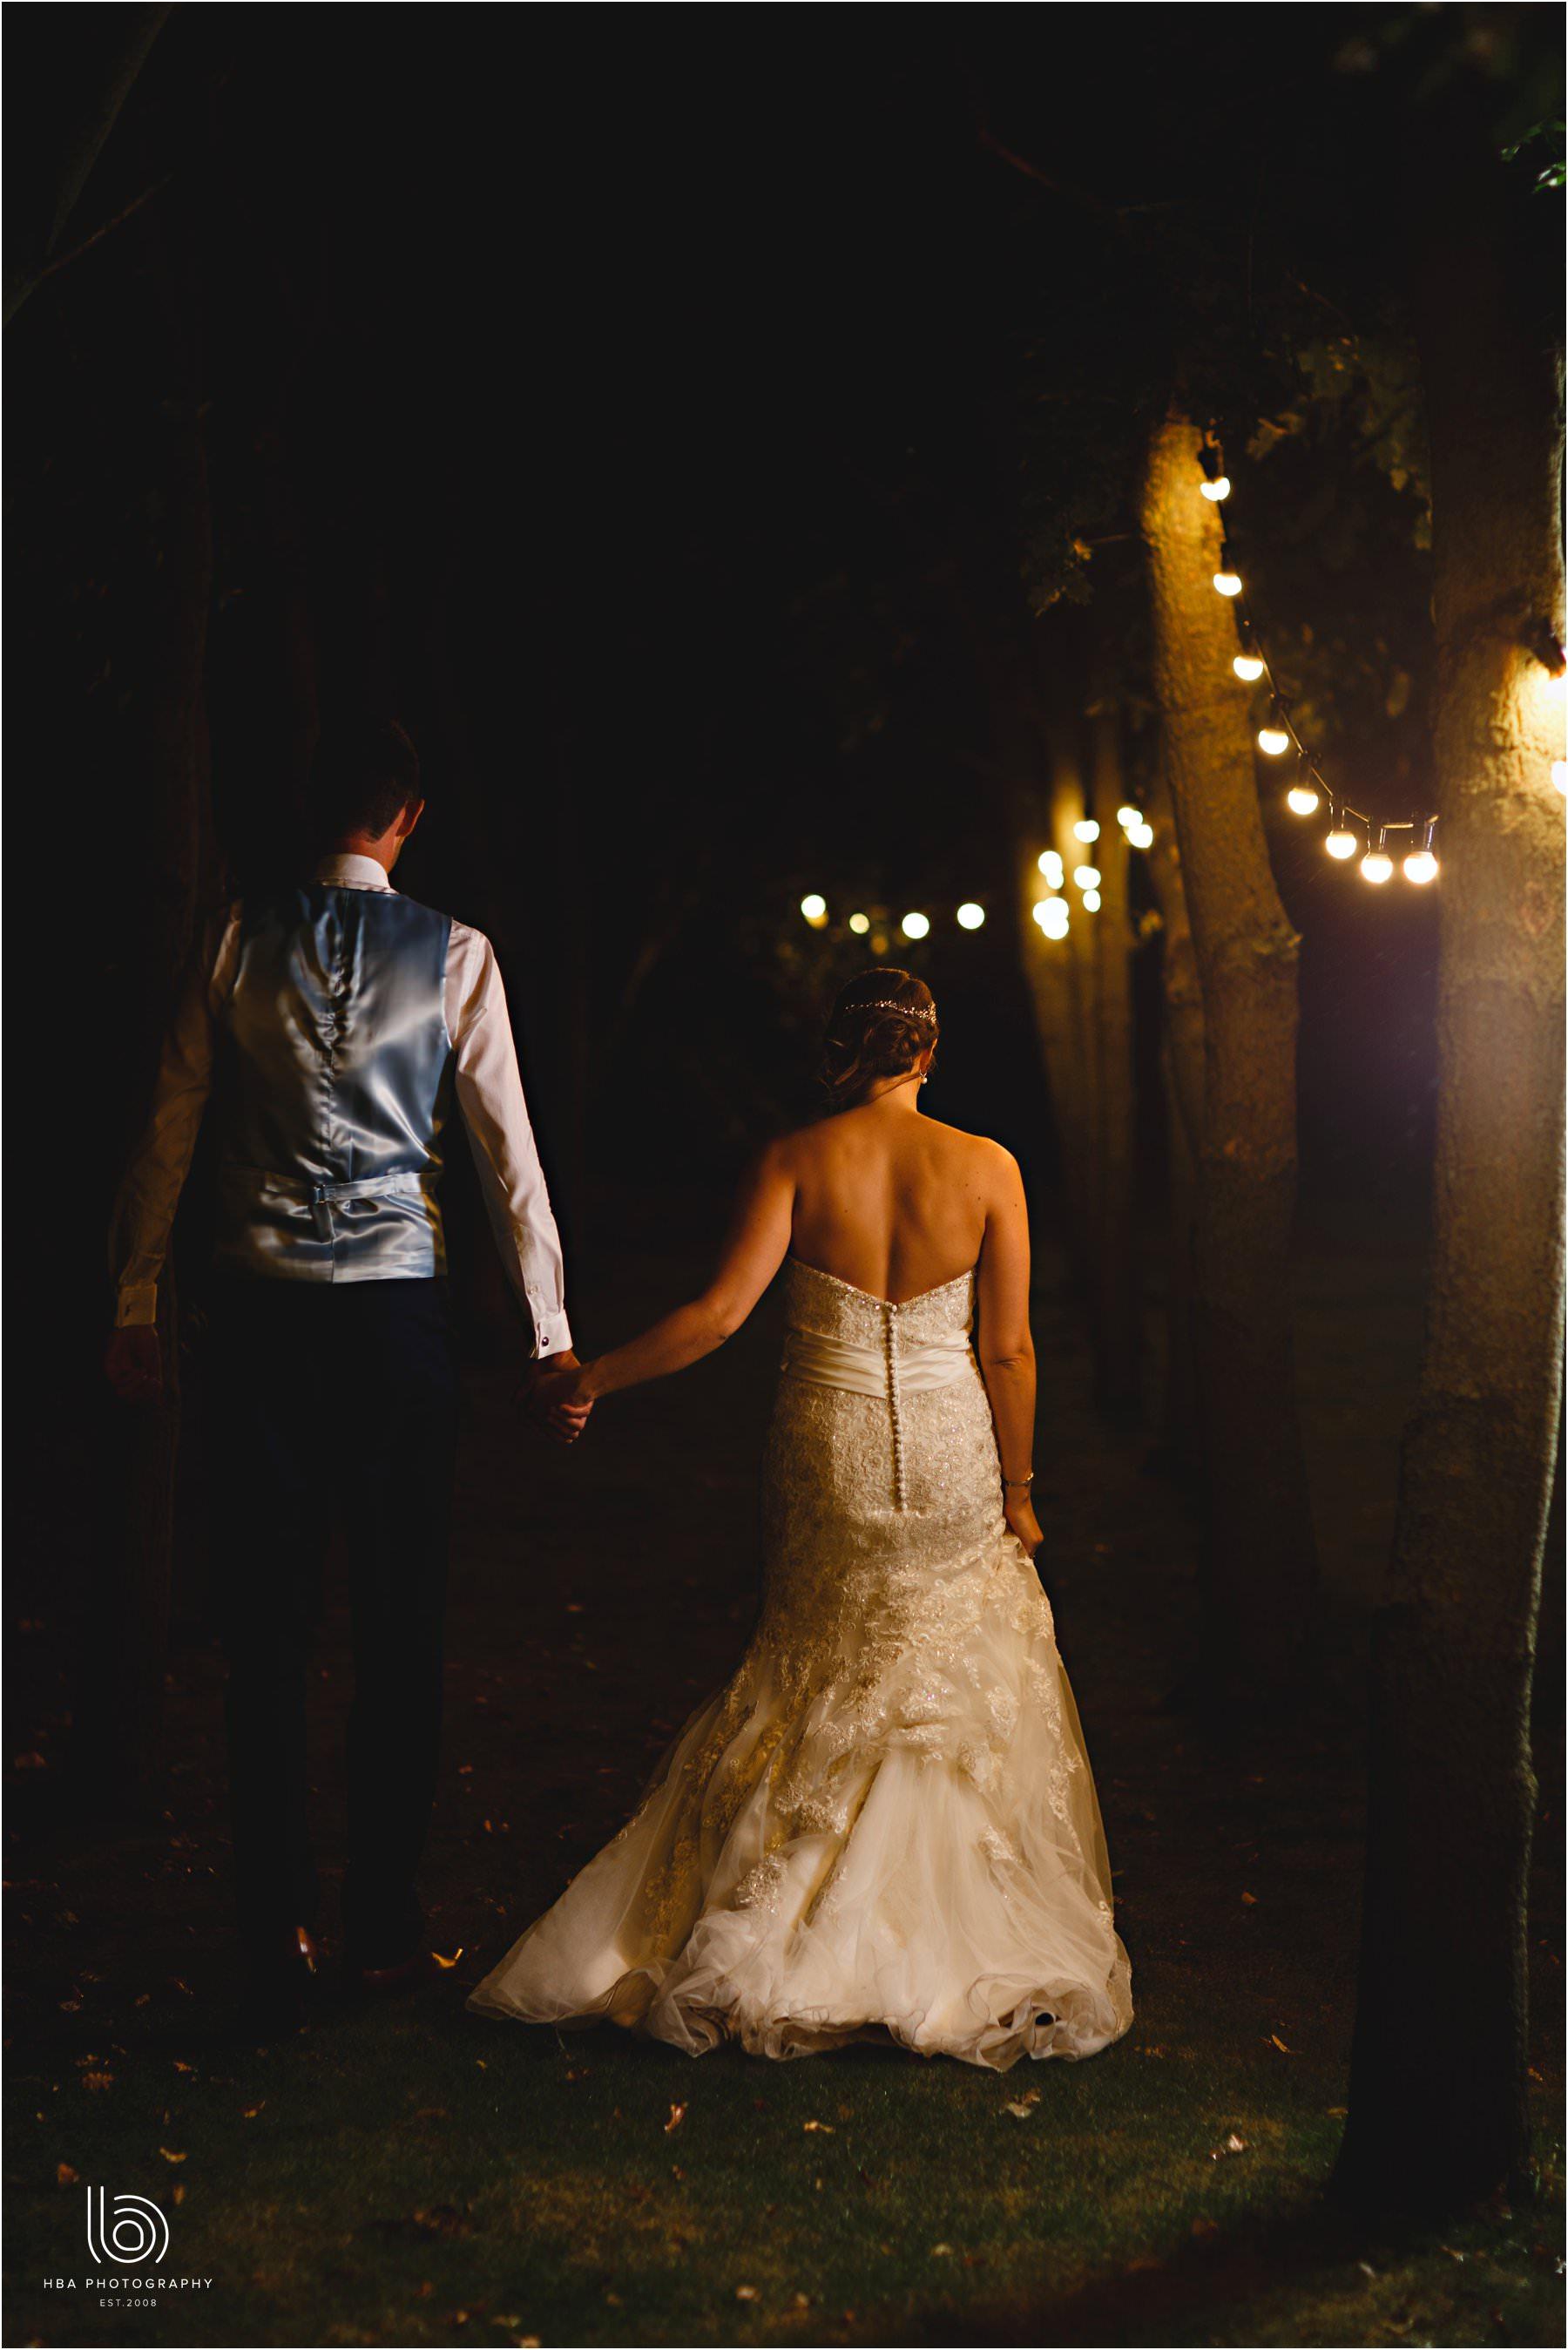 the bride & groom t night